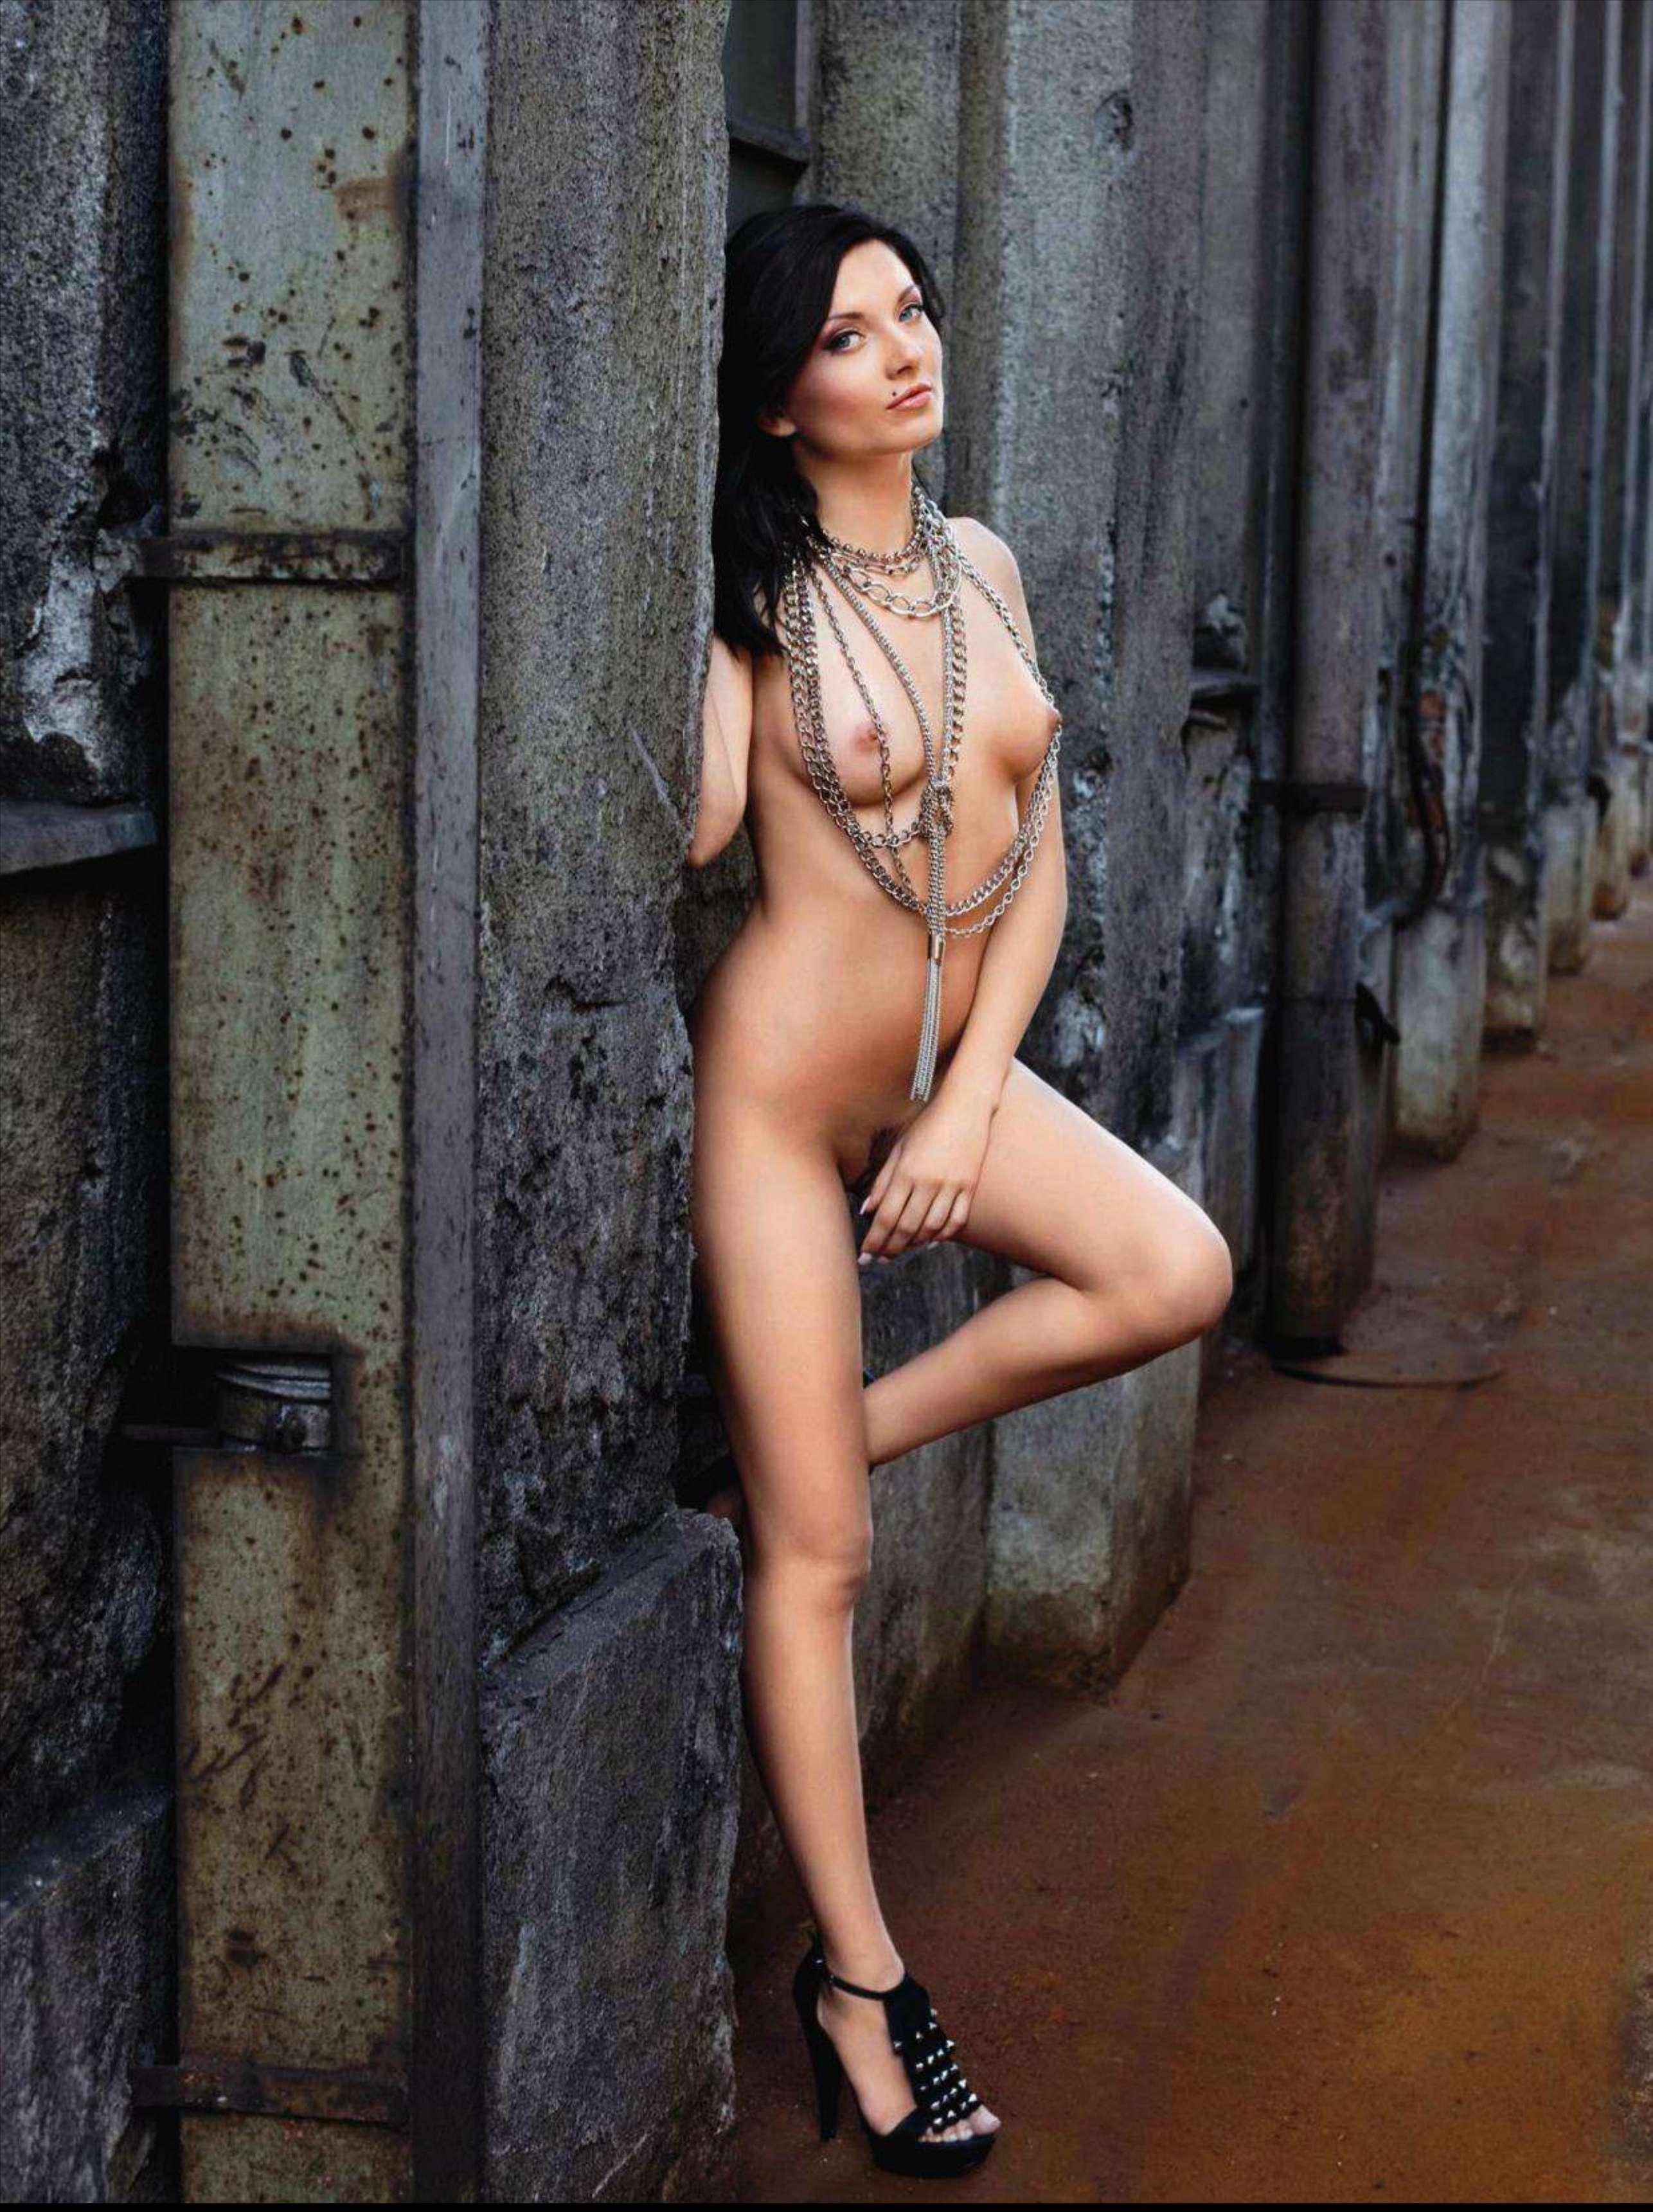 843971684_Playboy_2011_11_Slovenia_Scanof.net_087_123_453lo.jpg